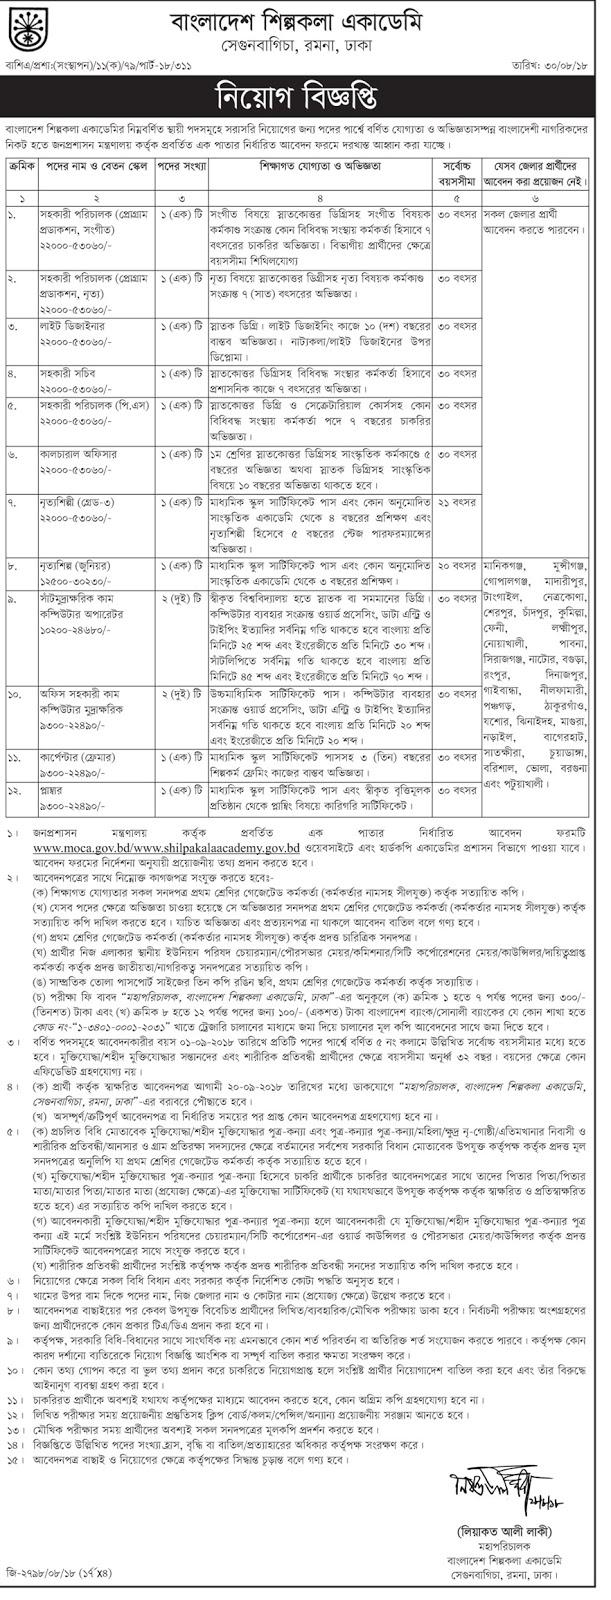 Bangladesh Shilpakala Academy Job Circular 2018